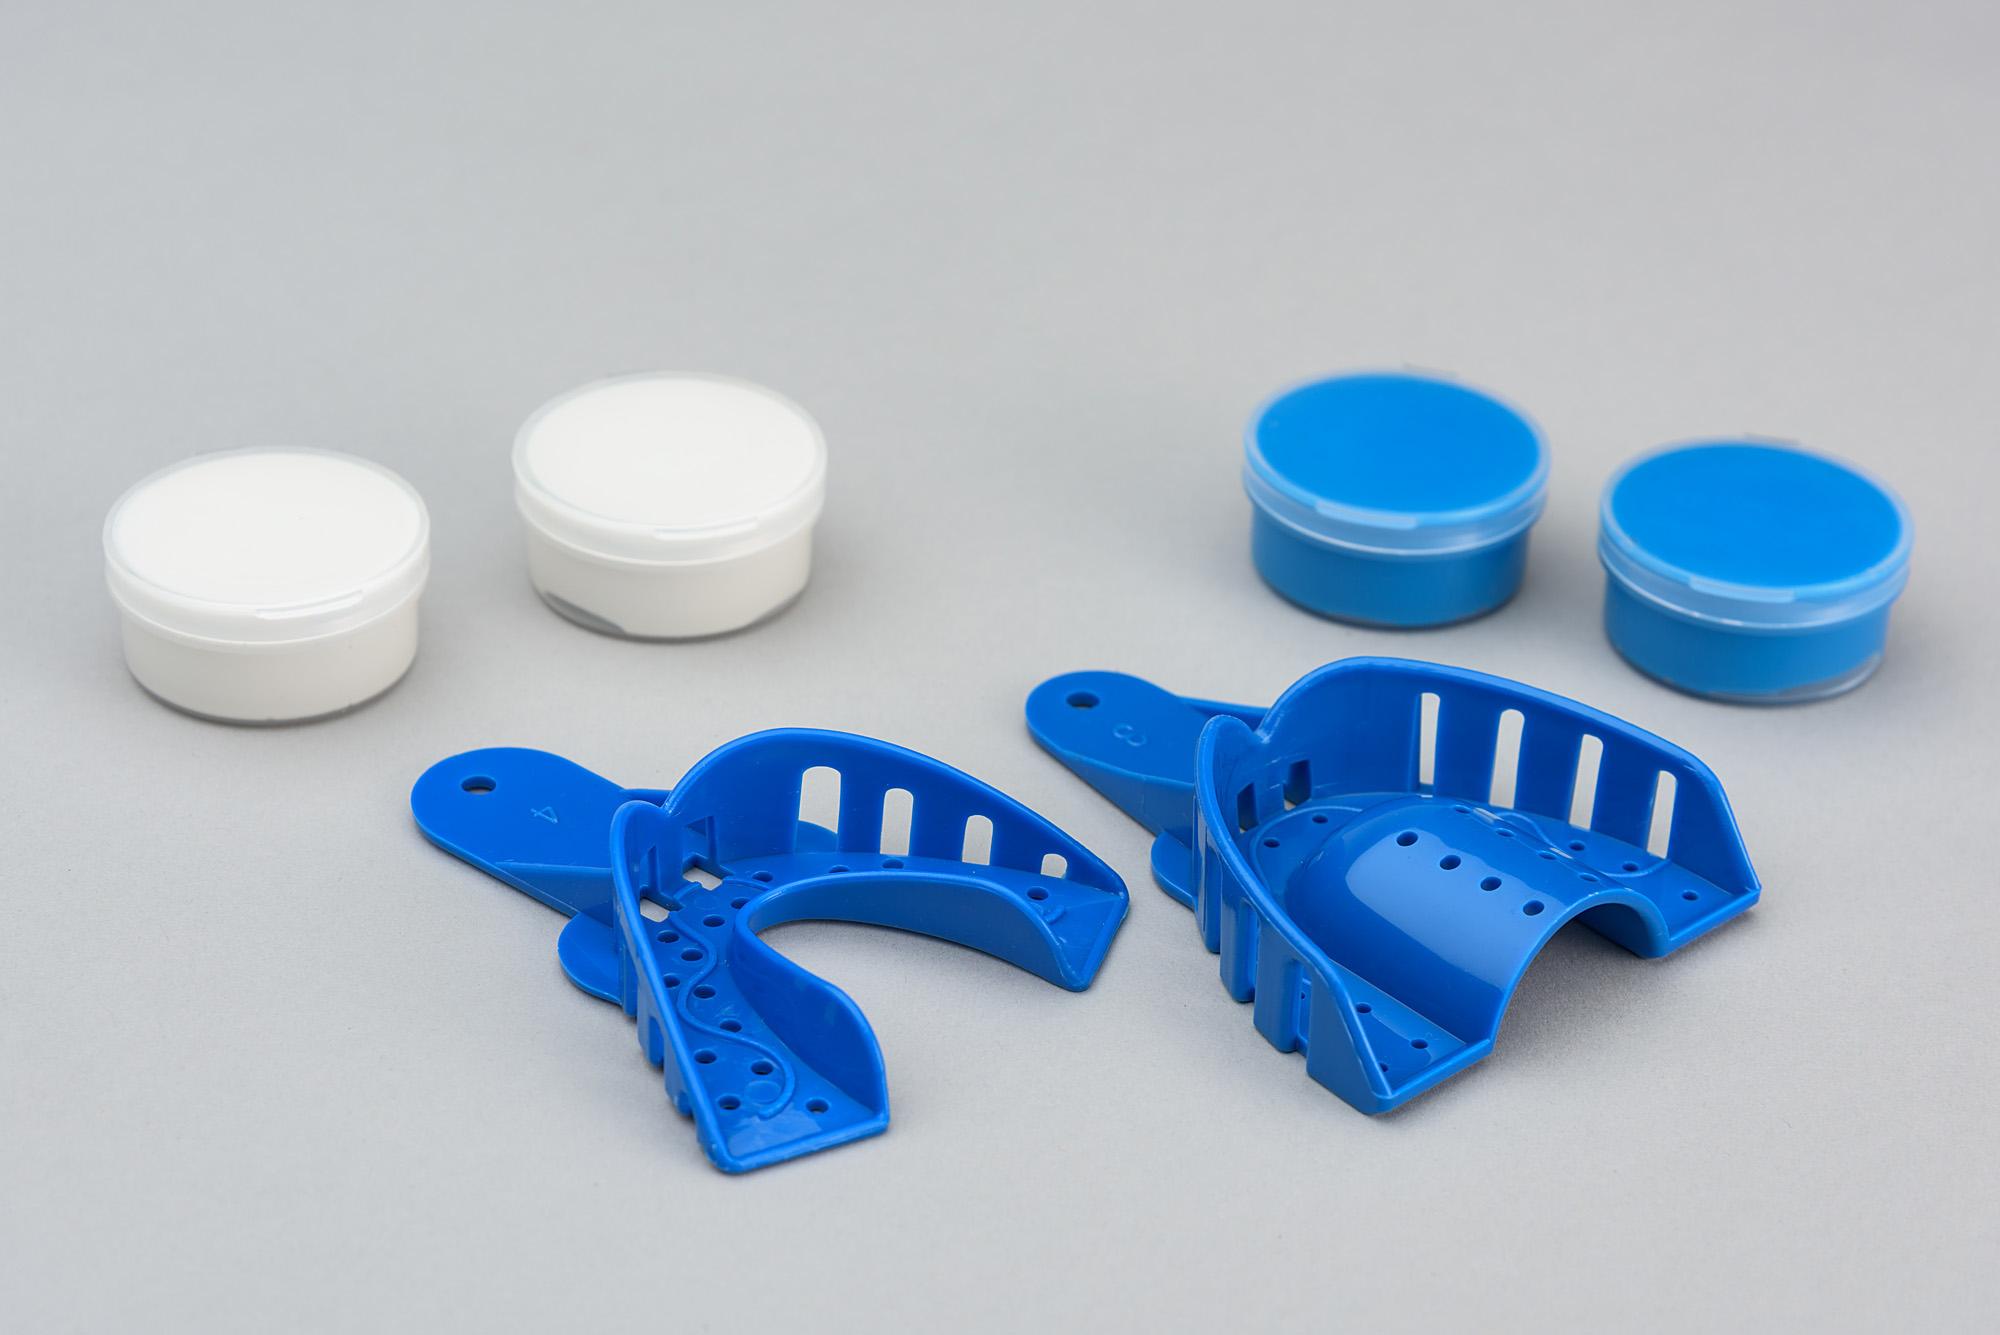 dental self impression kit everythingteeth. Black Bedroom Furniture Sets. Home Design Ideas